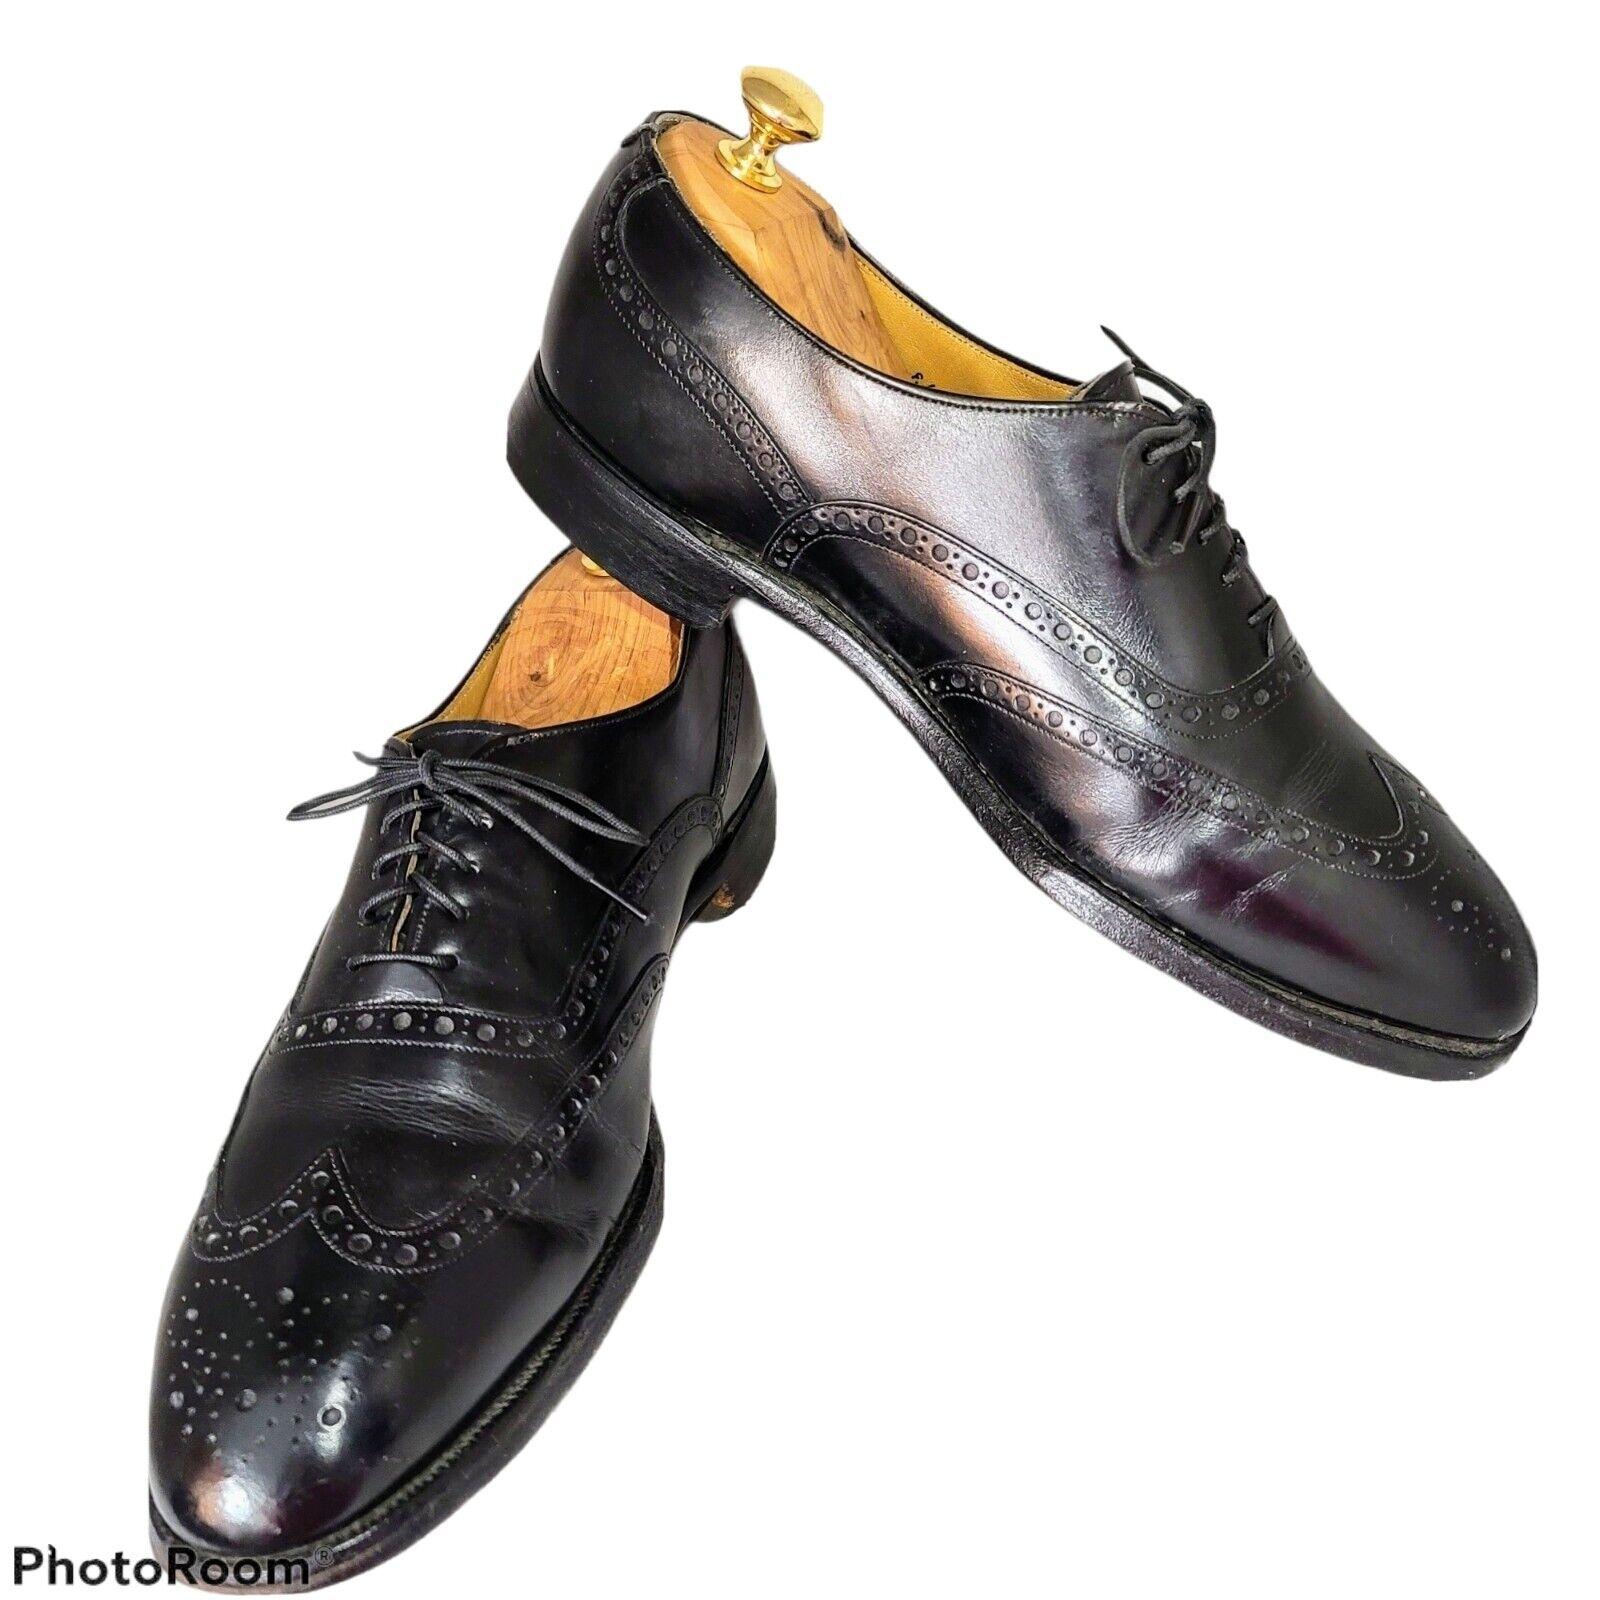 Johnston & Murphy Aristocraft Black Sz 9 1/2E Wingtip Dress Shoes made in USA